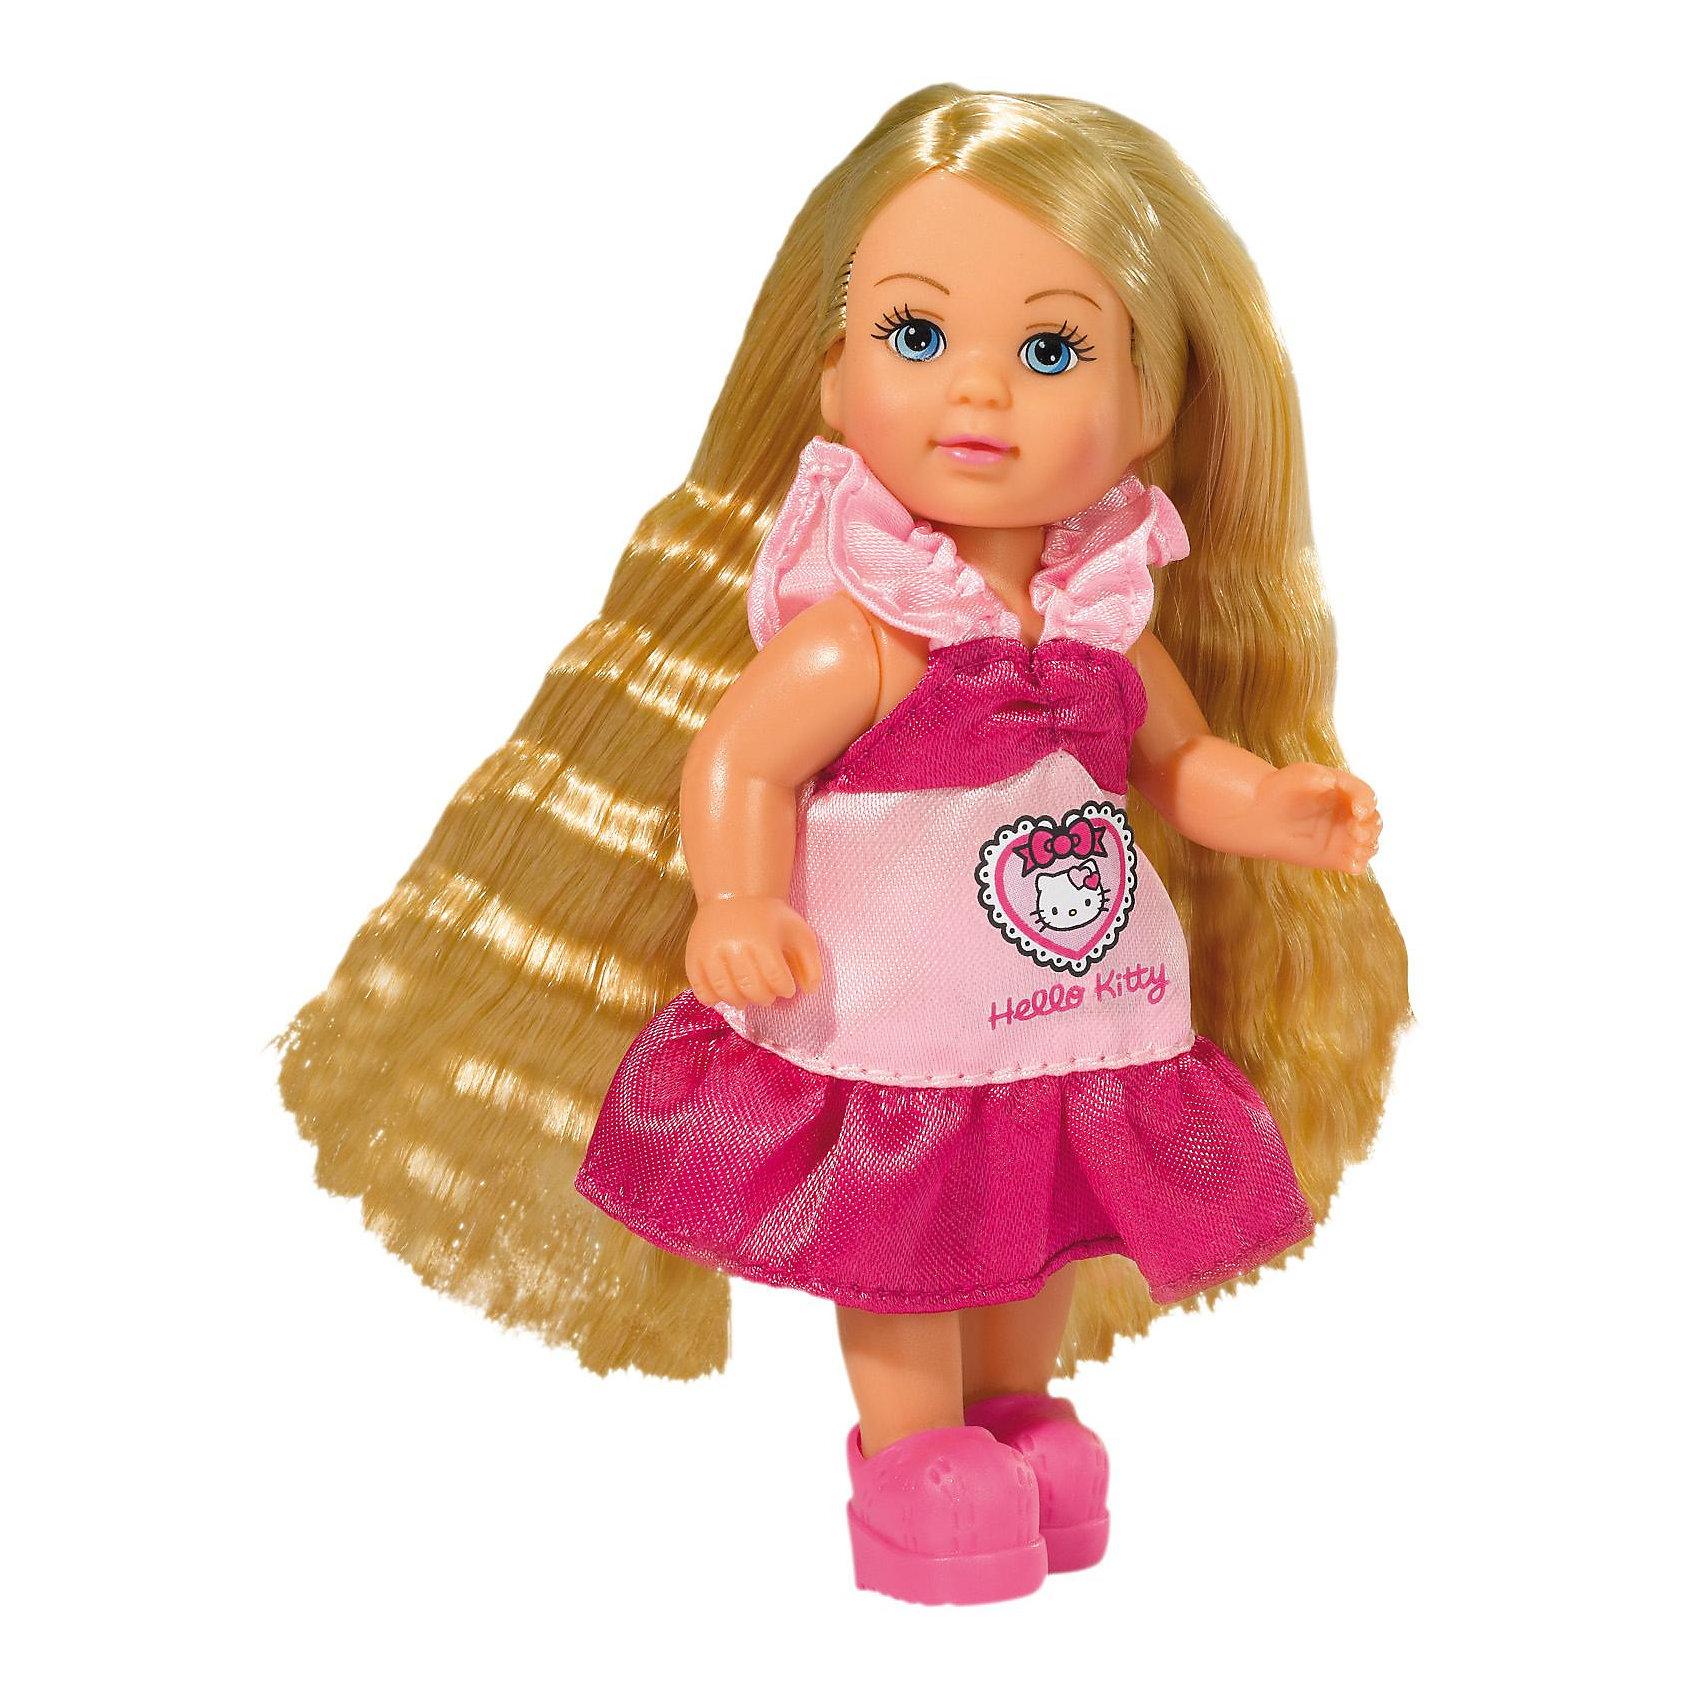 Simba Еви с длинными волосами + 2 расчески + заколочки, Hello Kitty simba мини кукла еви в костюме hello kitty цвет белый черный